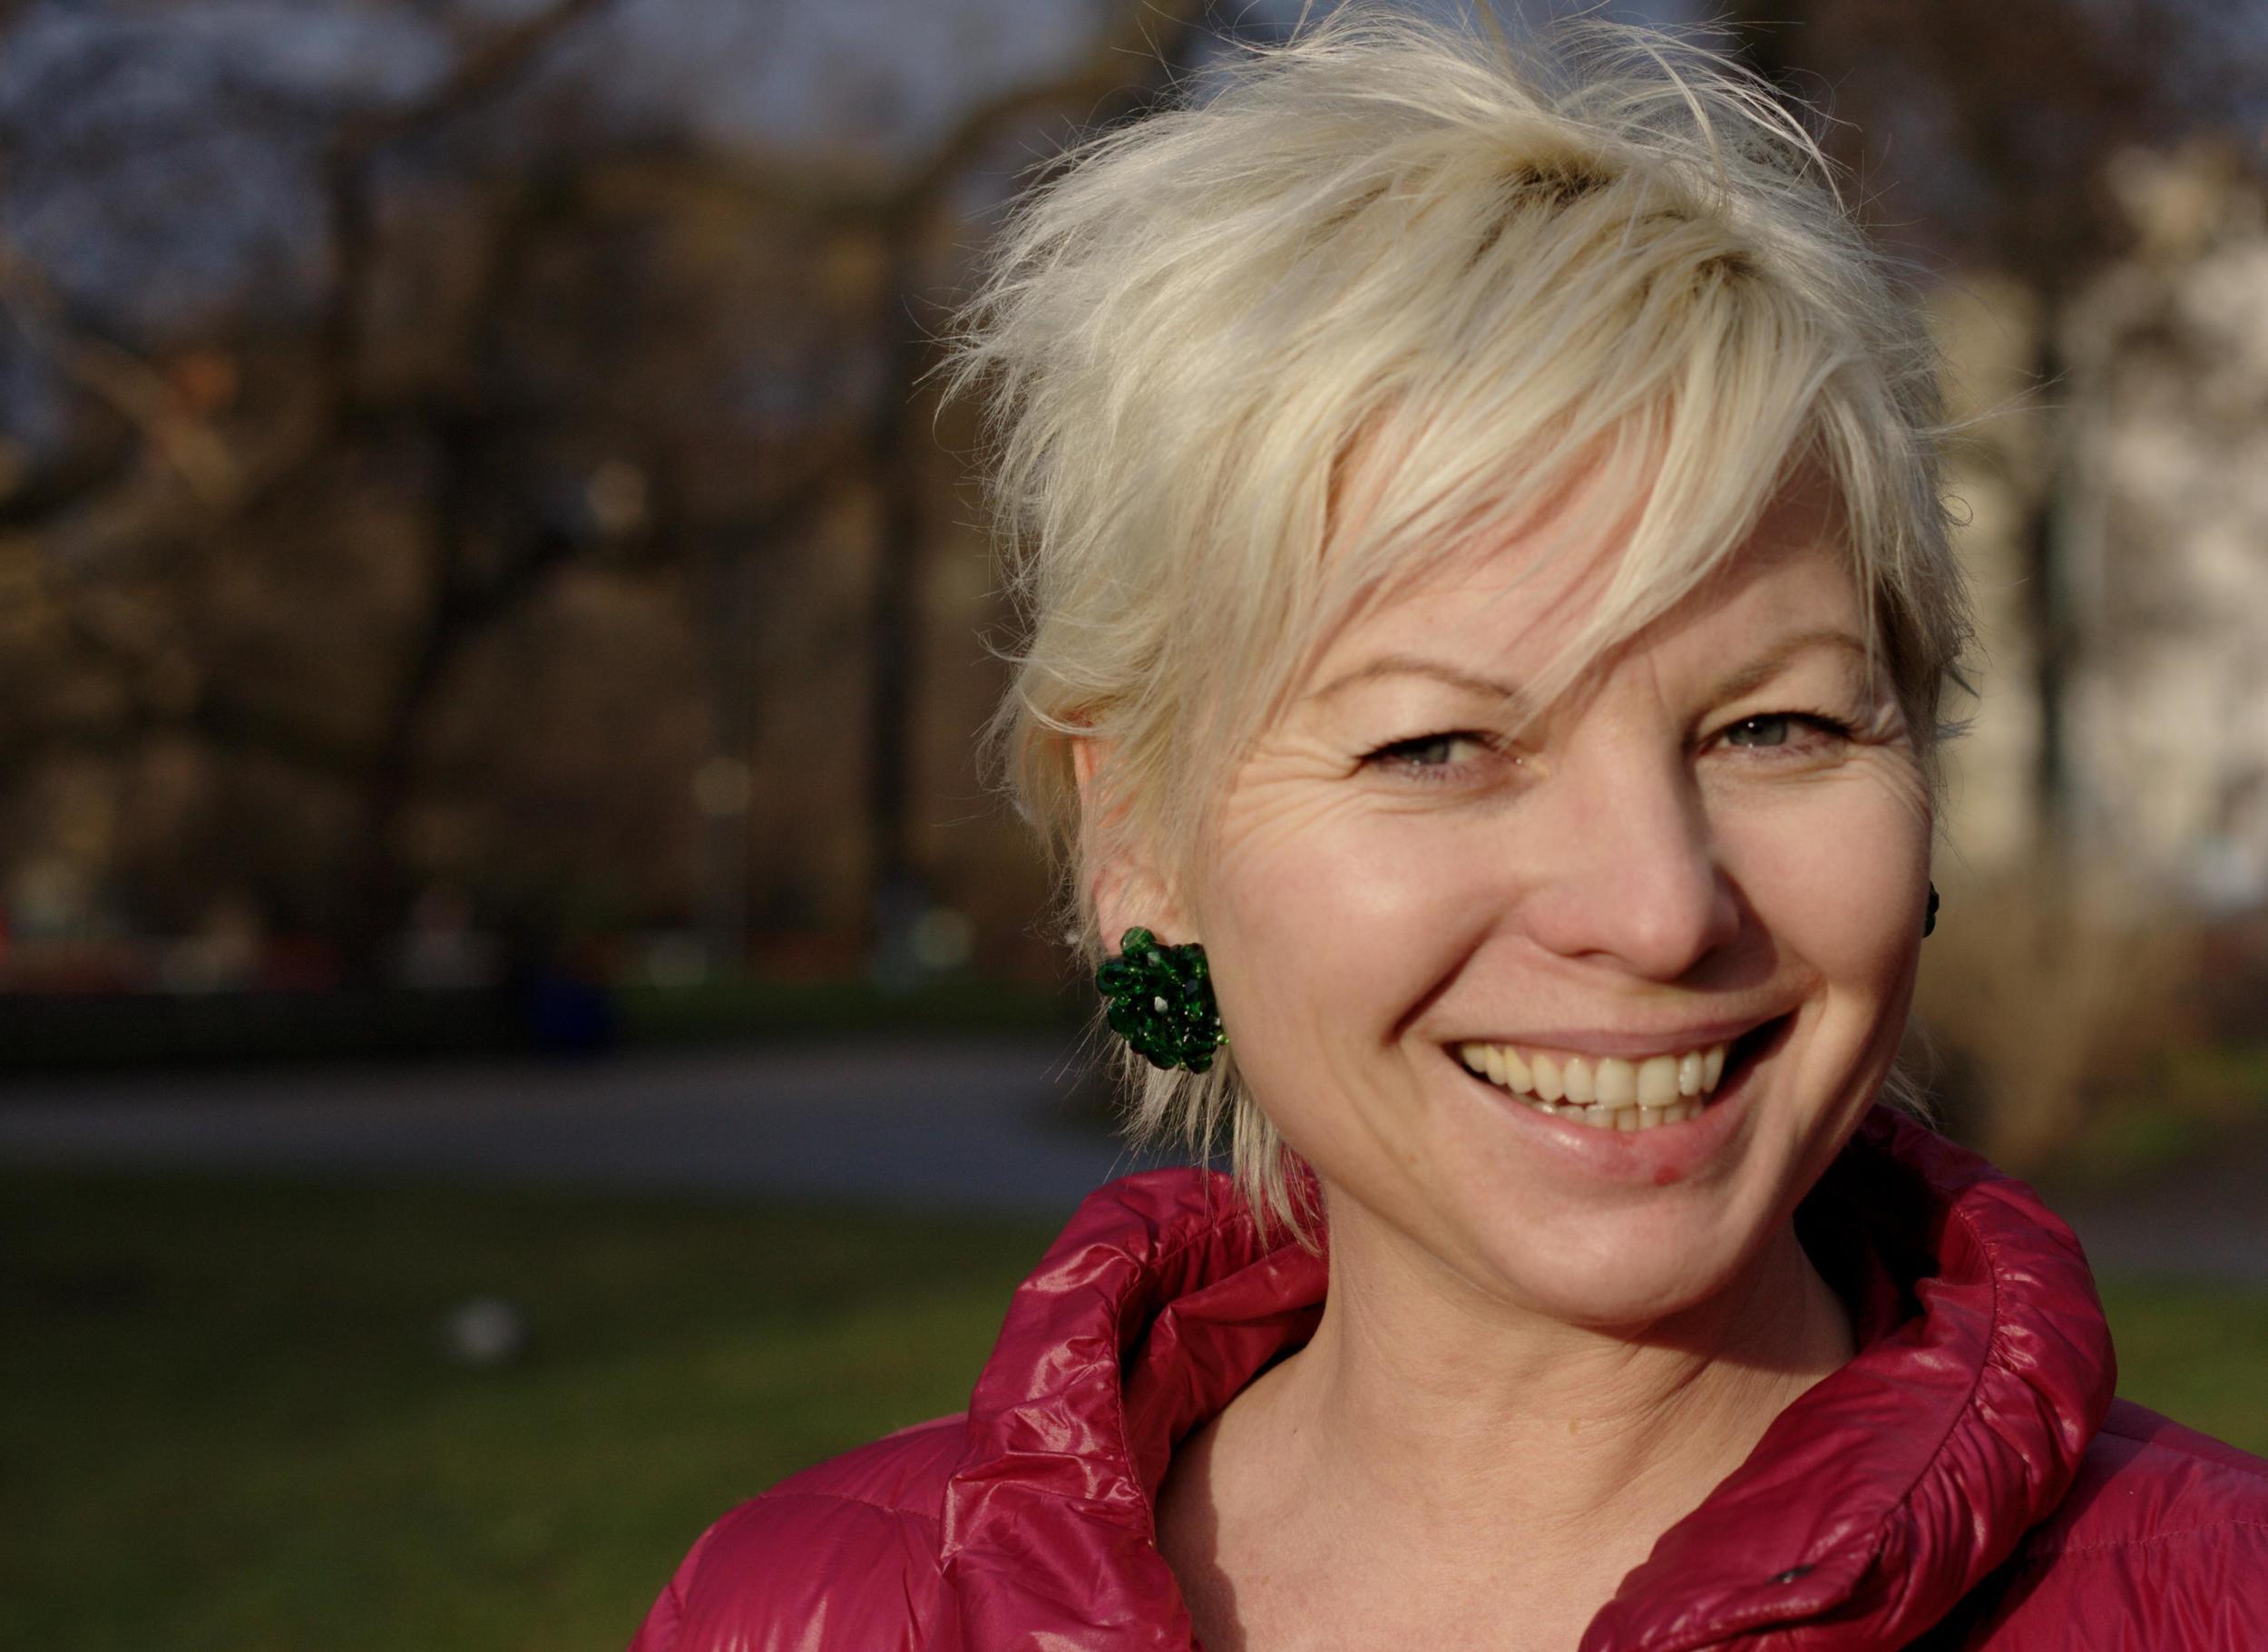 Jitka Trevisan, foto (c) Monika Grilli Wagnerová